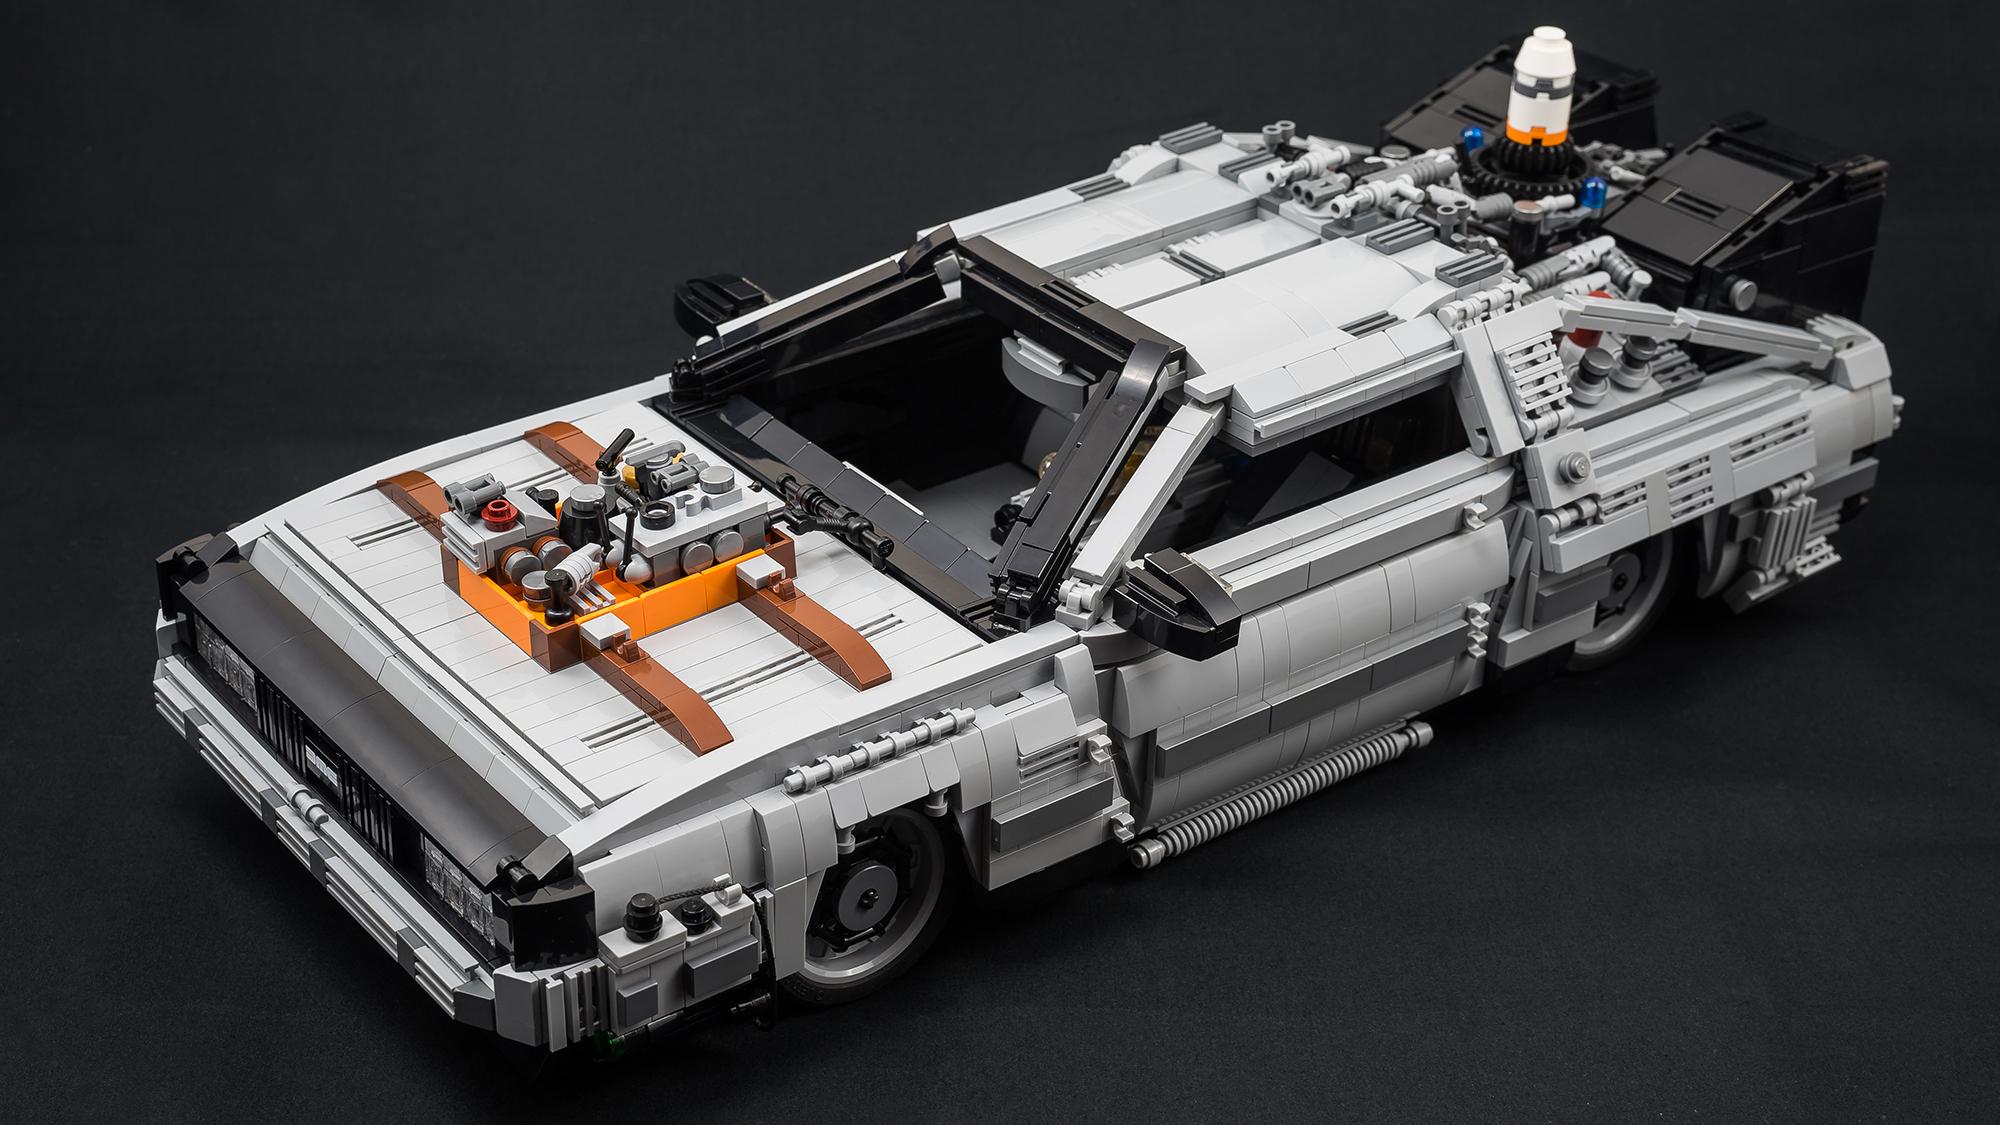 Wallpaper : LEGO, Brick, creation, afol, vehicle, time ...